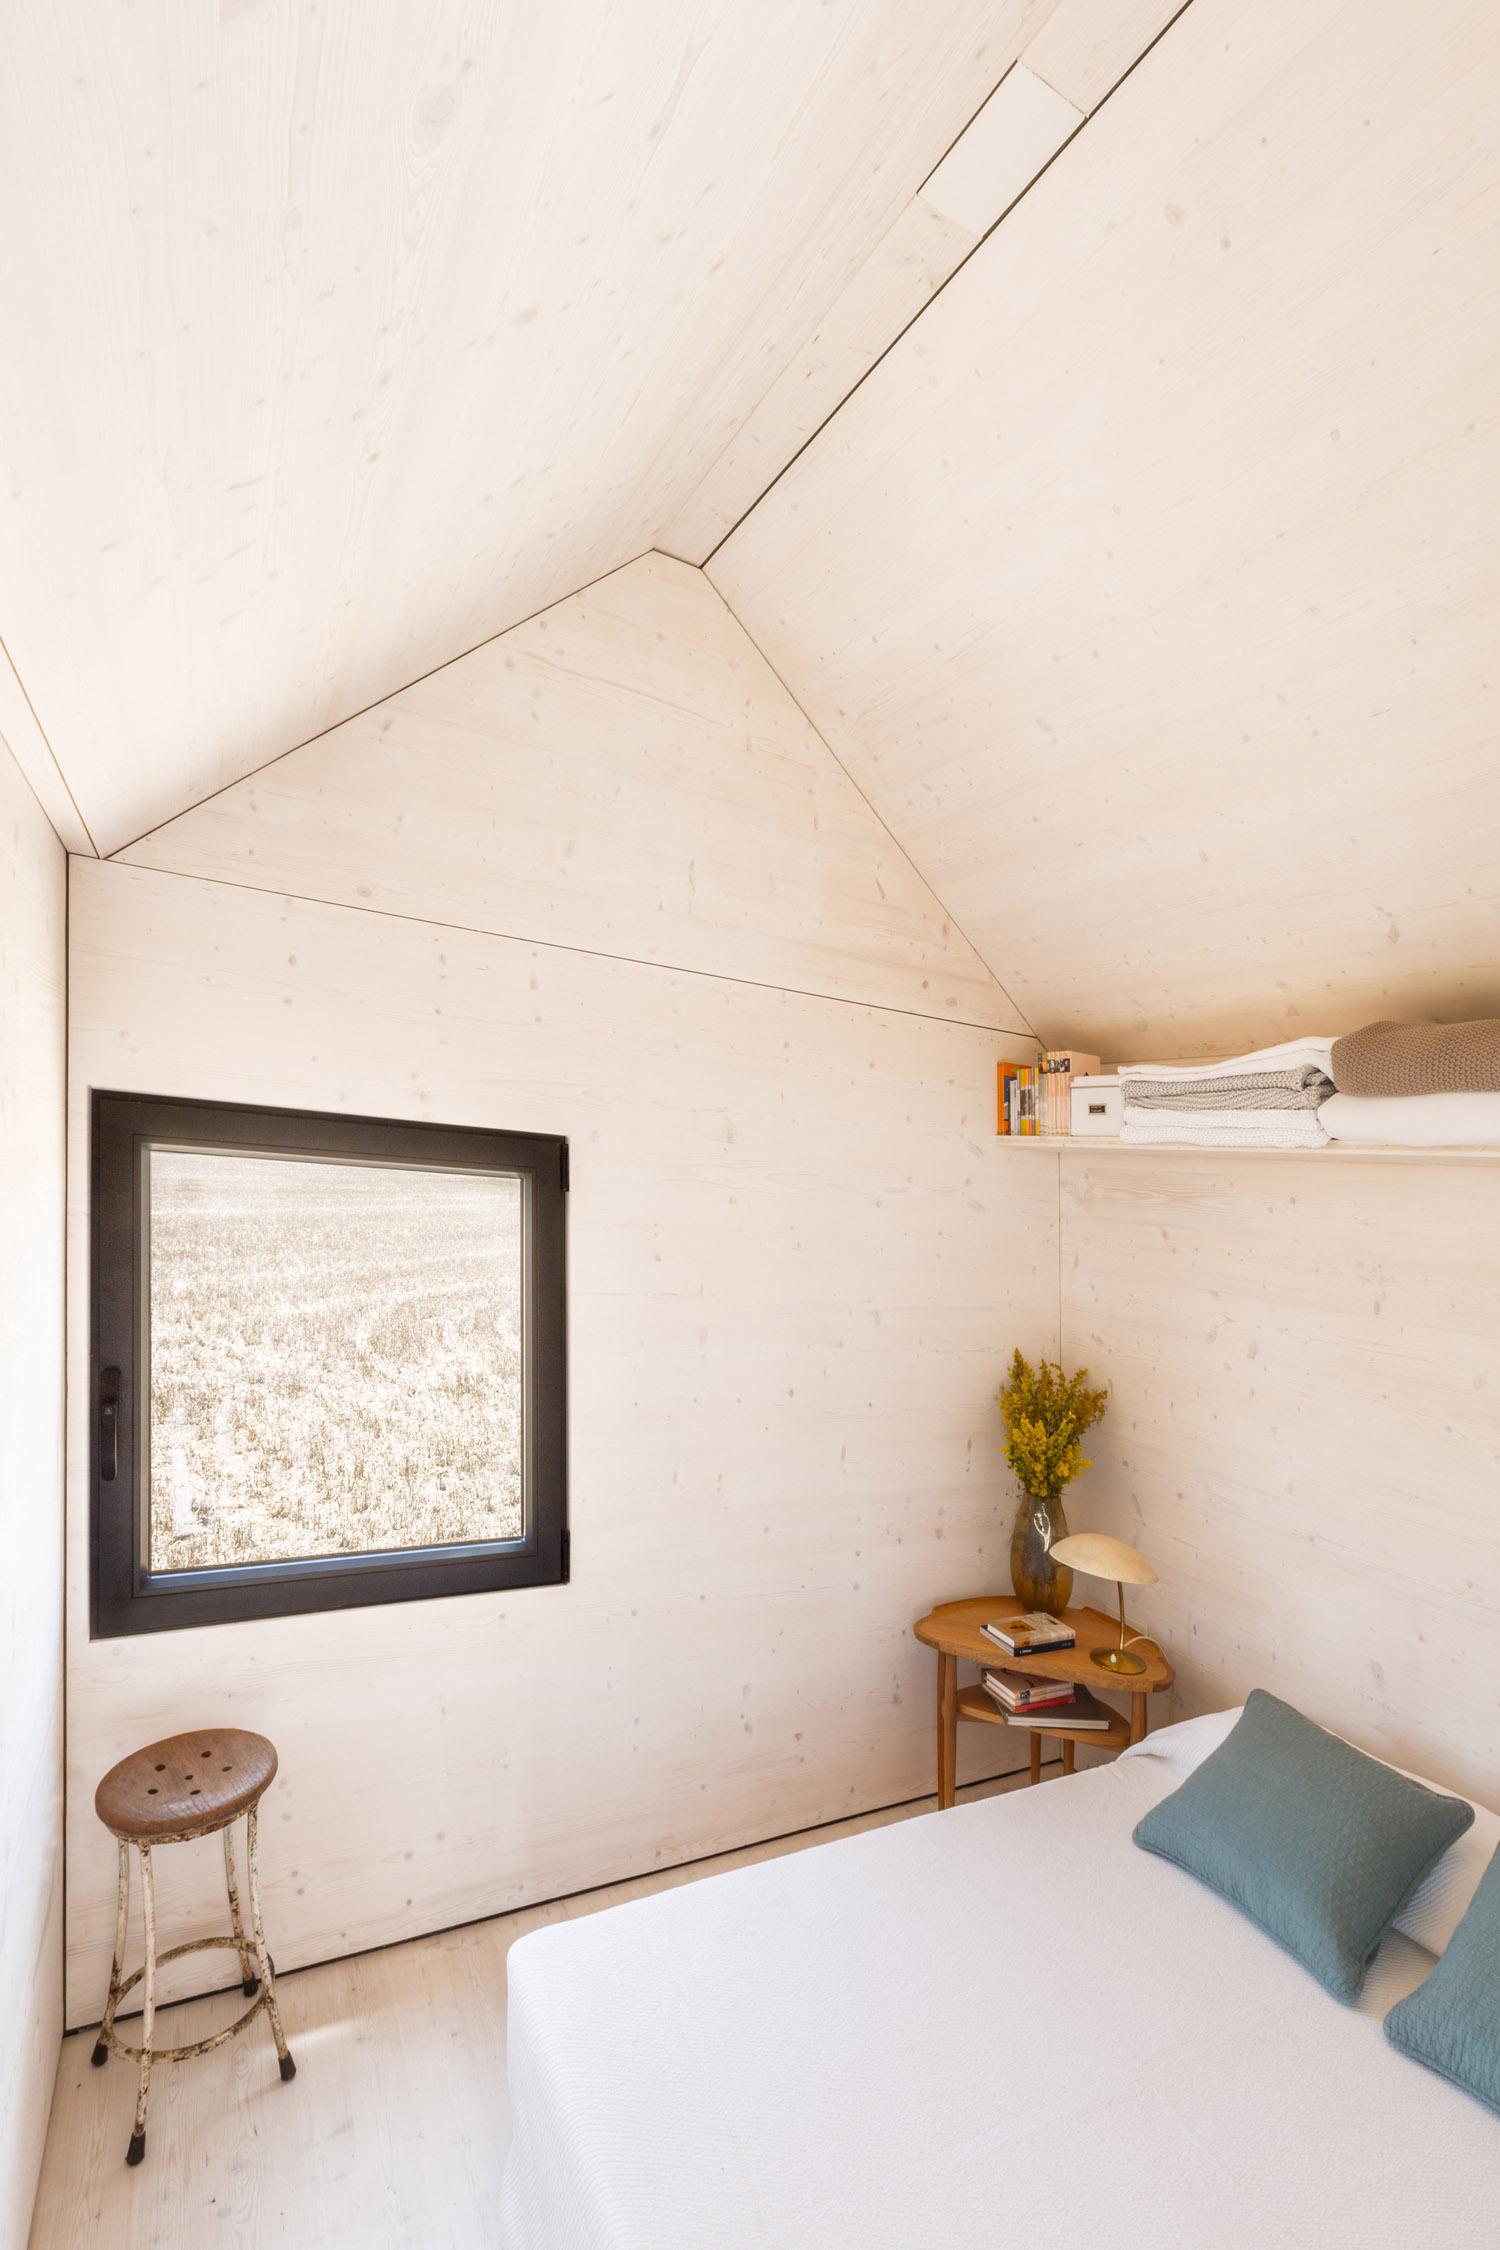 Portable home by architecture studio ÁBATON 15